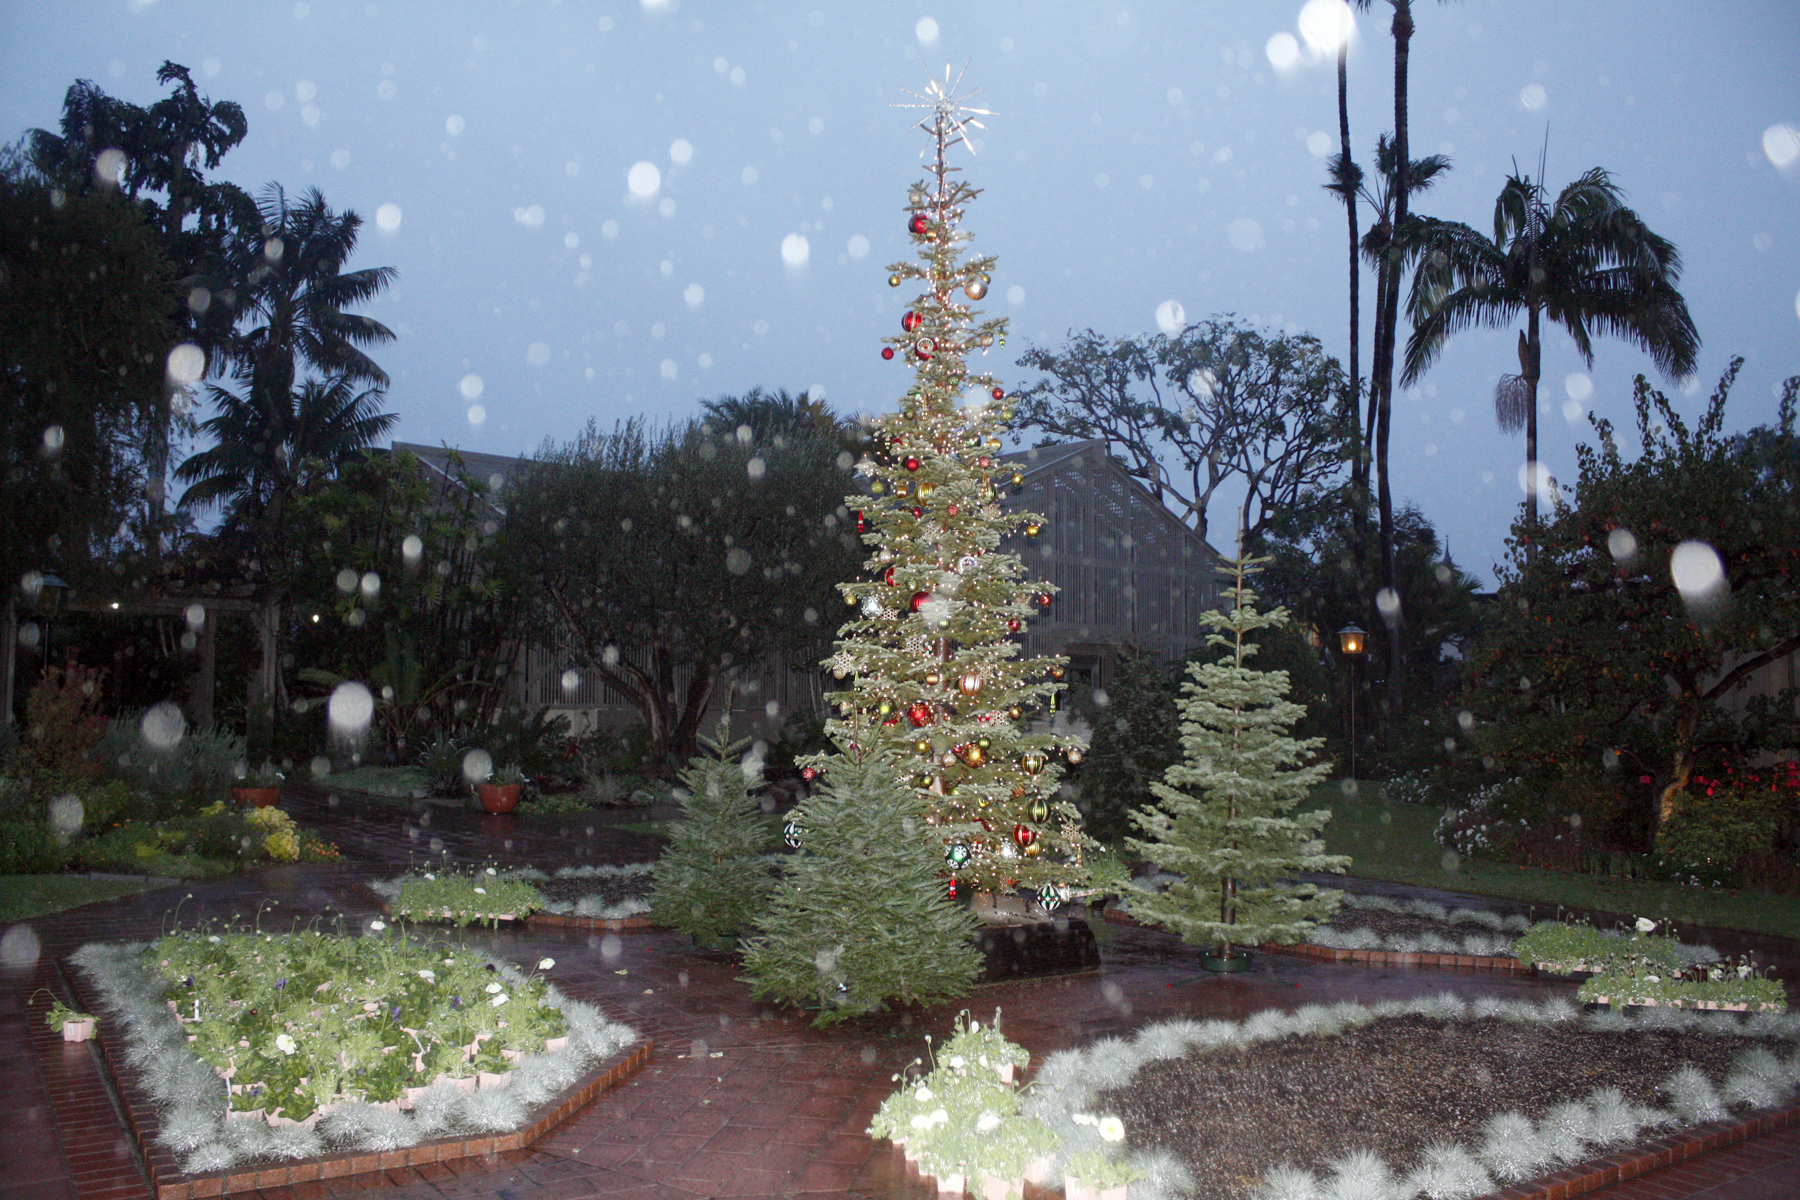 Newport Local News Nights Of A Thousand Lights At Sherman Gardens Dec 12 13 Newport Local News